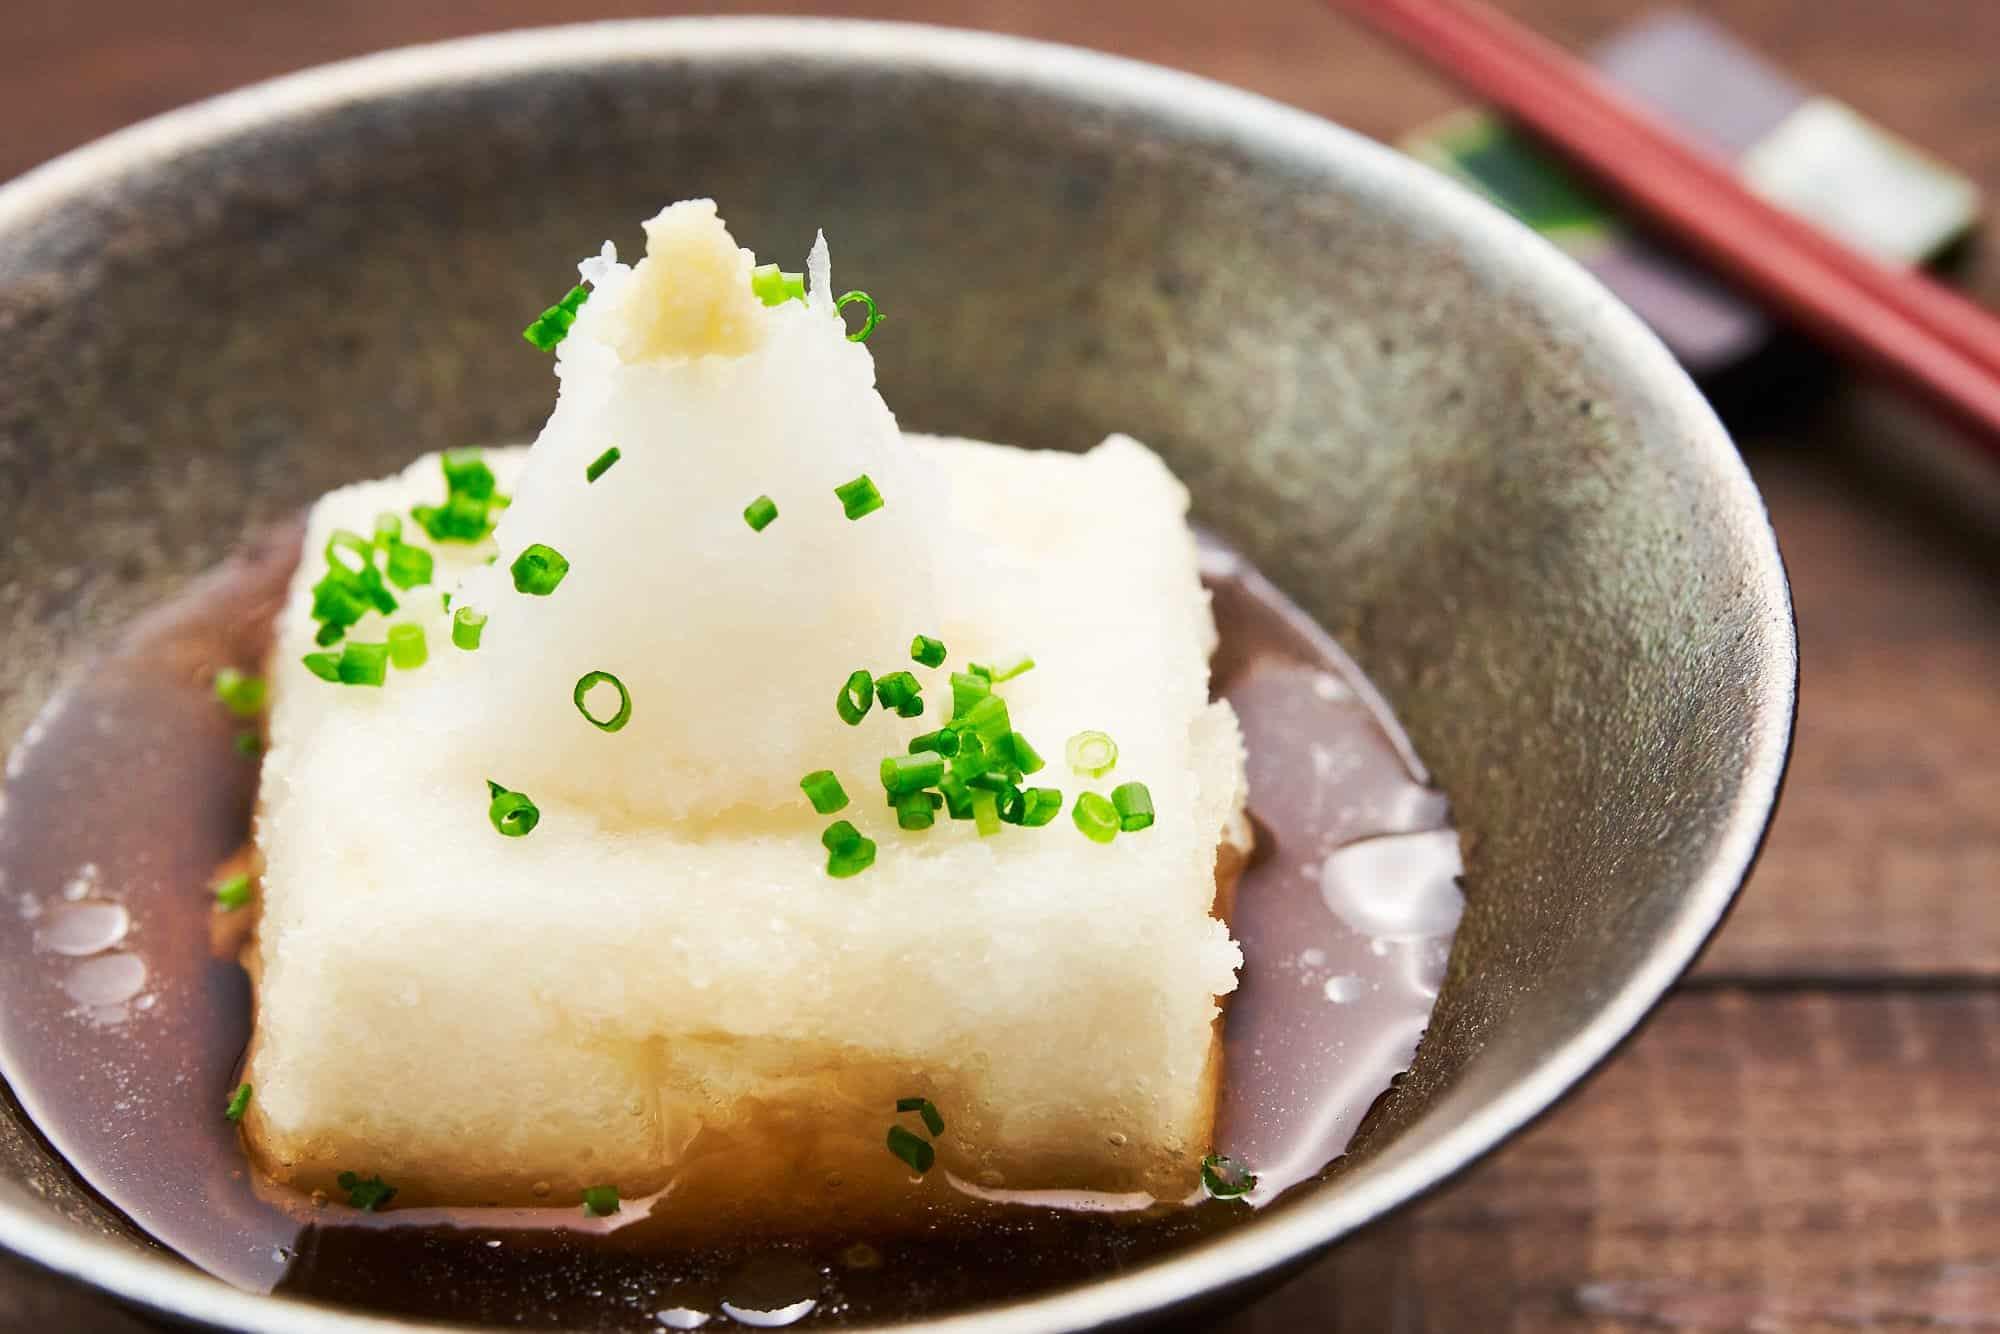 This plant-based agedashi tofu is made with a savory shiitake mushroom stock which makes it vegan-friendly.